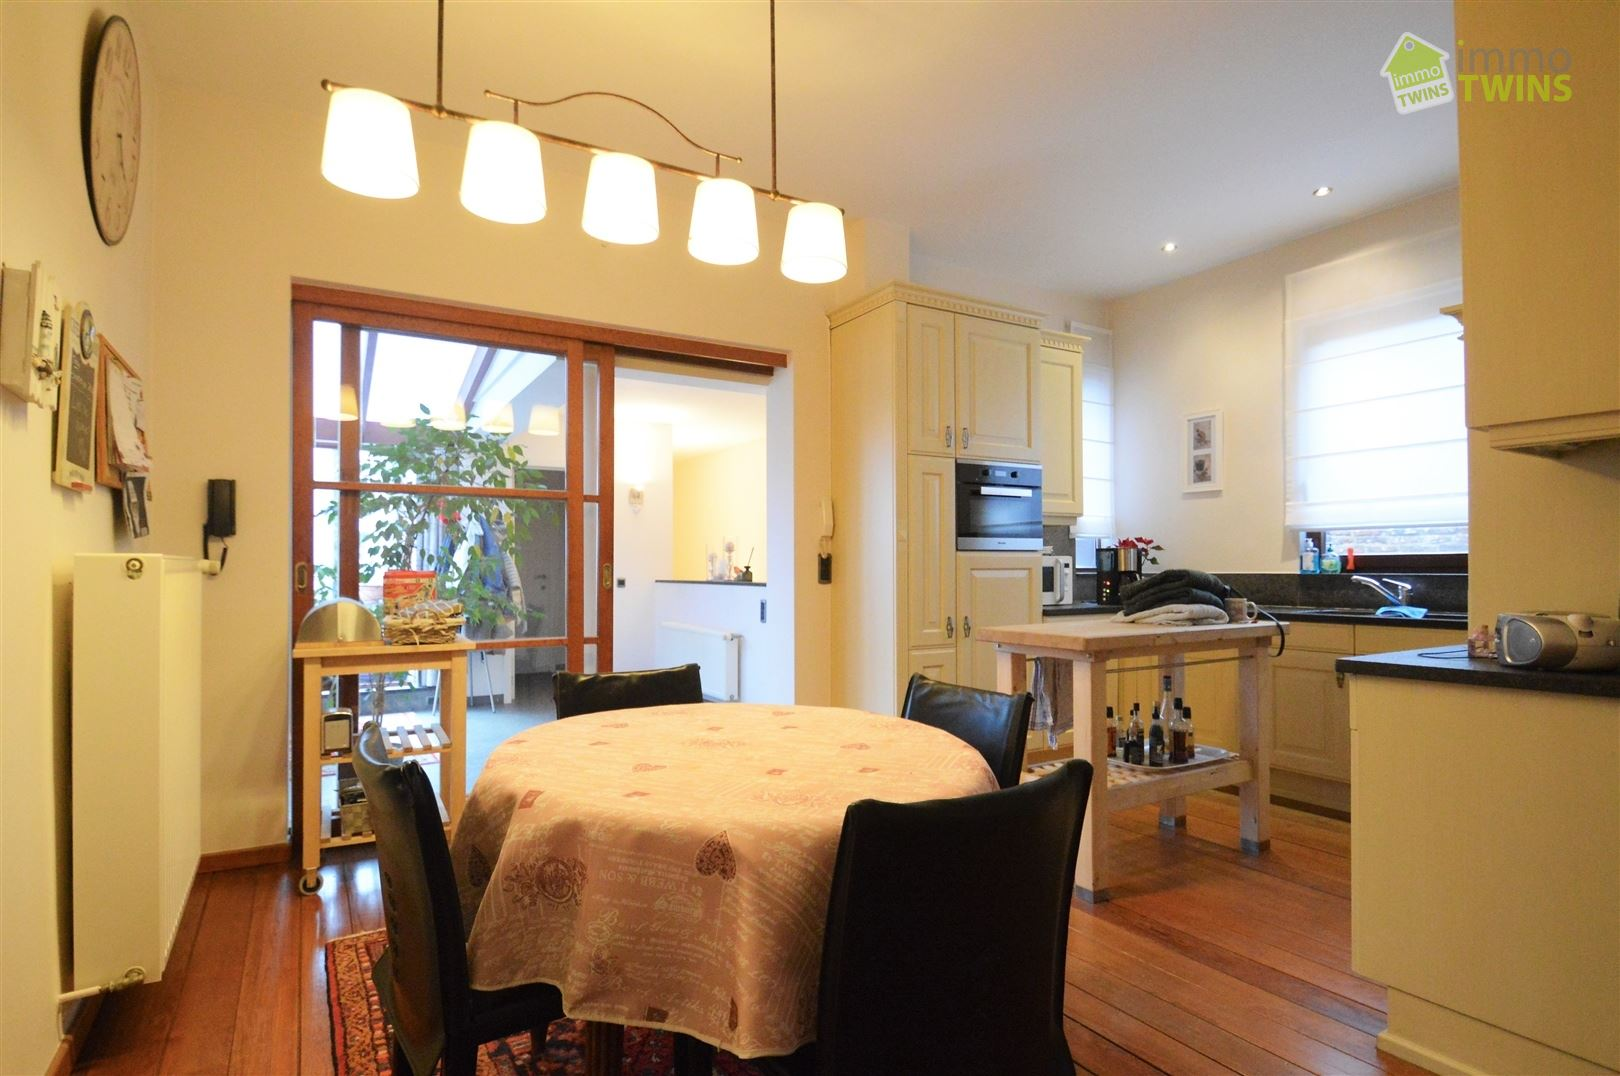 Foto 7 : Duplex/Penthouse te 2890 SINT-AMANDS (België) - Prijs € 429.000